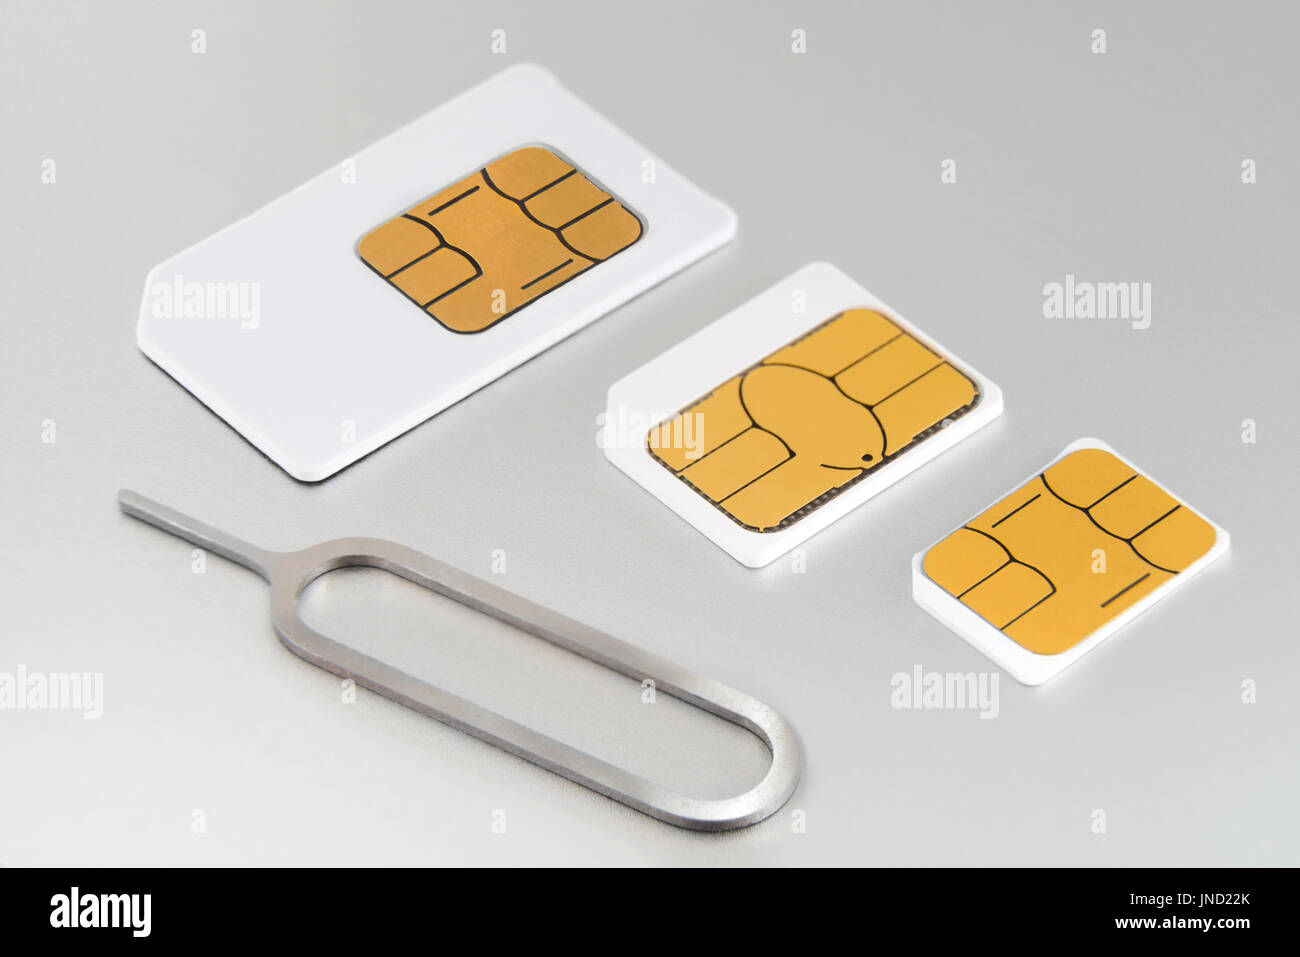 three types of gsm sim cards mini sim micro sim and nano sim stock photo royalty free image. Black Bedroom Furniture Sets. Home Design Ideas